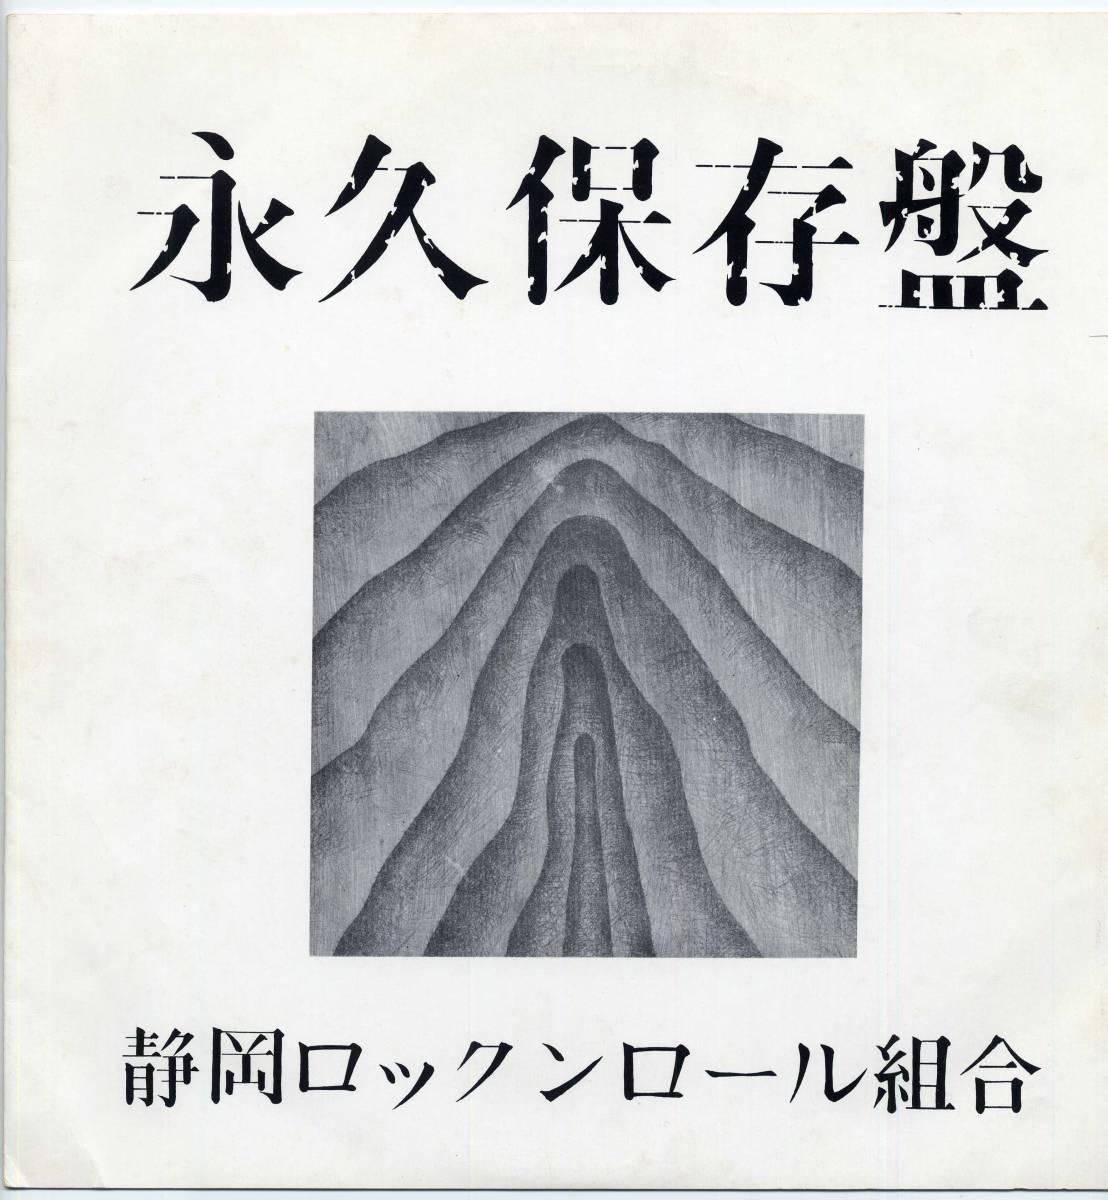 LP★静岡ロックンロール組合/永久保存盤(自主盤'73日本のロック)★Shizuoka Rock'n'roll Kumiai/DSL-001735/PRIVATE/RCサクセション村八分_画像2